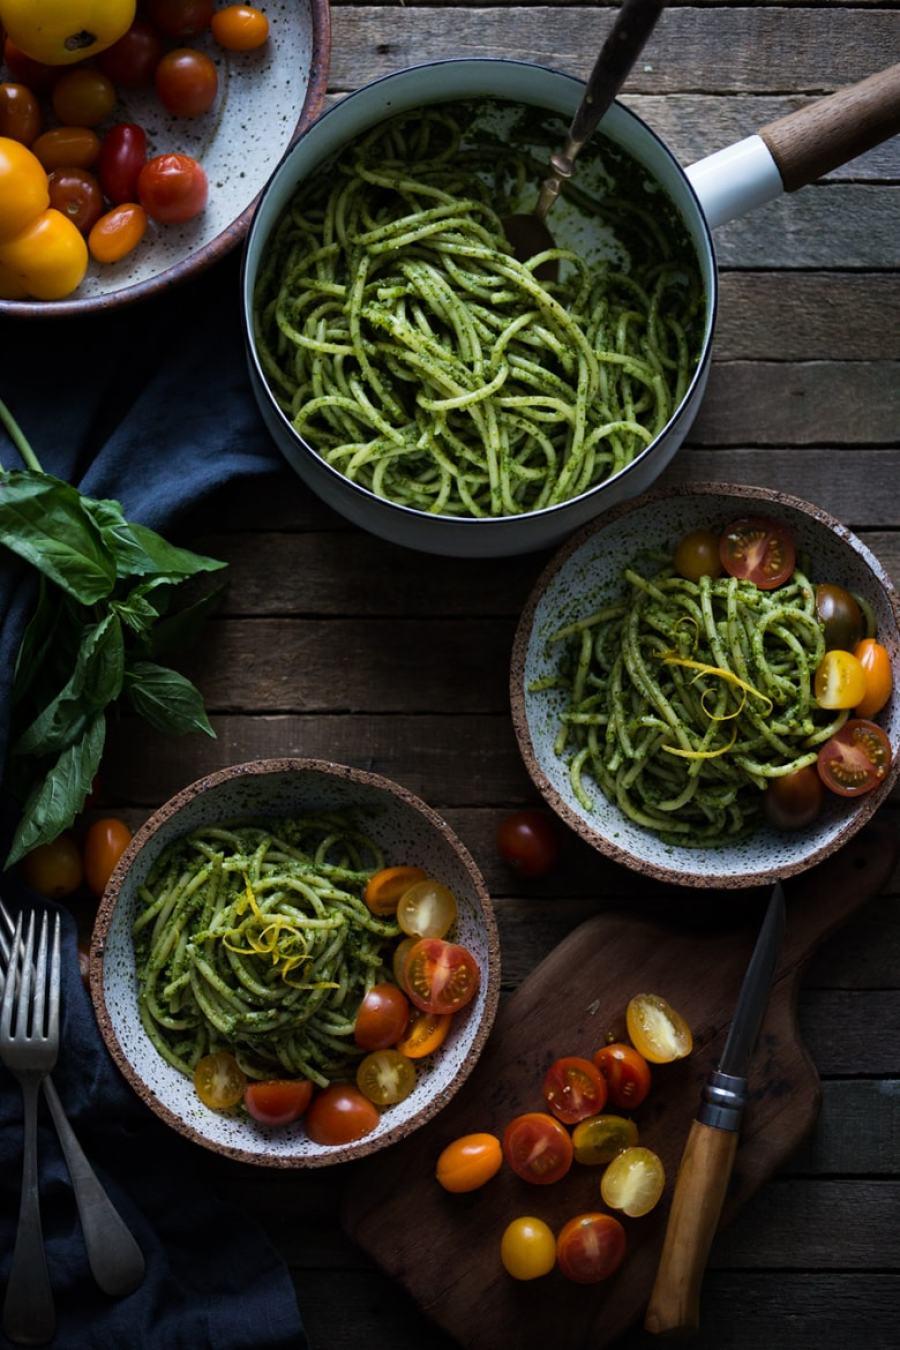 Bucatini Pasta with Arugula Almond Pesto & Heirloom Tomatoes